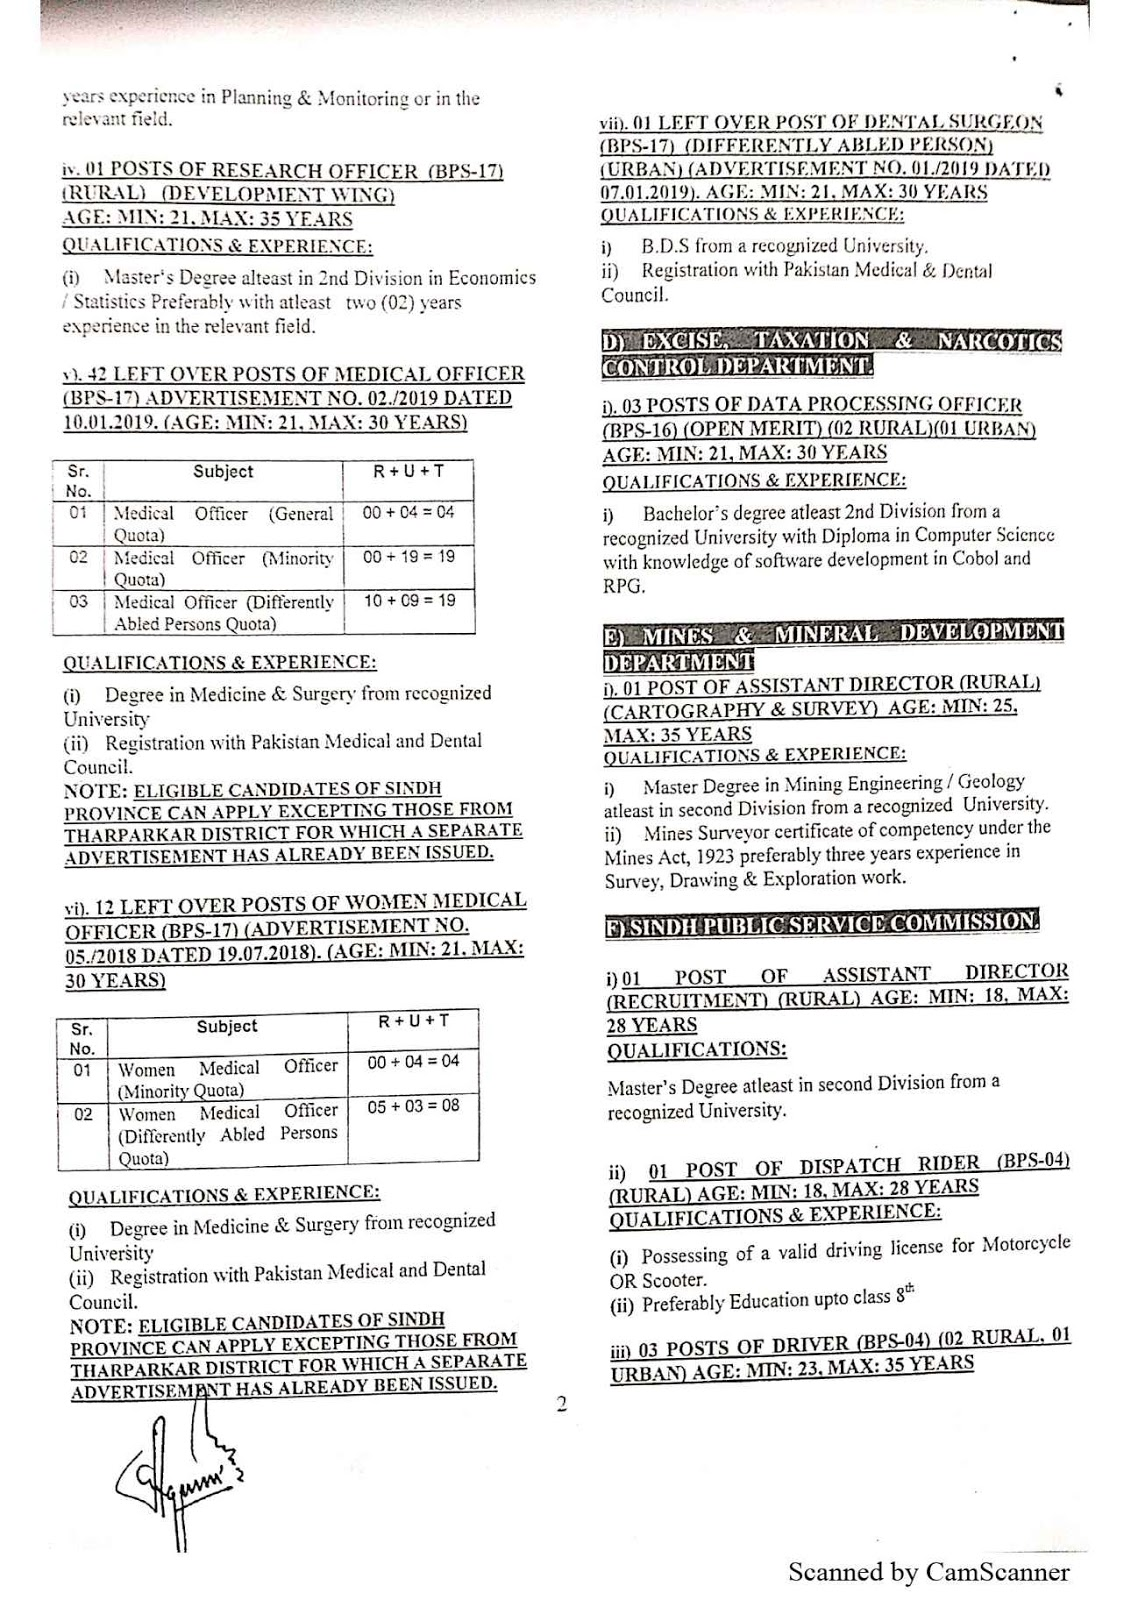 SPSC – SINDH PUBLIC SERVICE COMMISSION (AD NO. 01/2020) Latest Jobs Advertisement – Apply Online